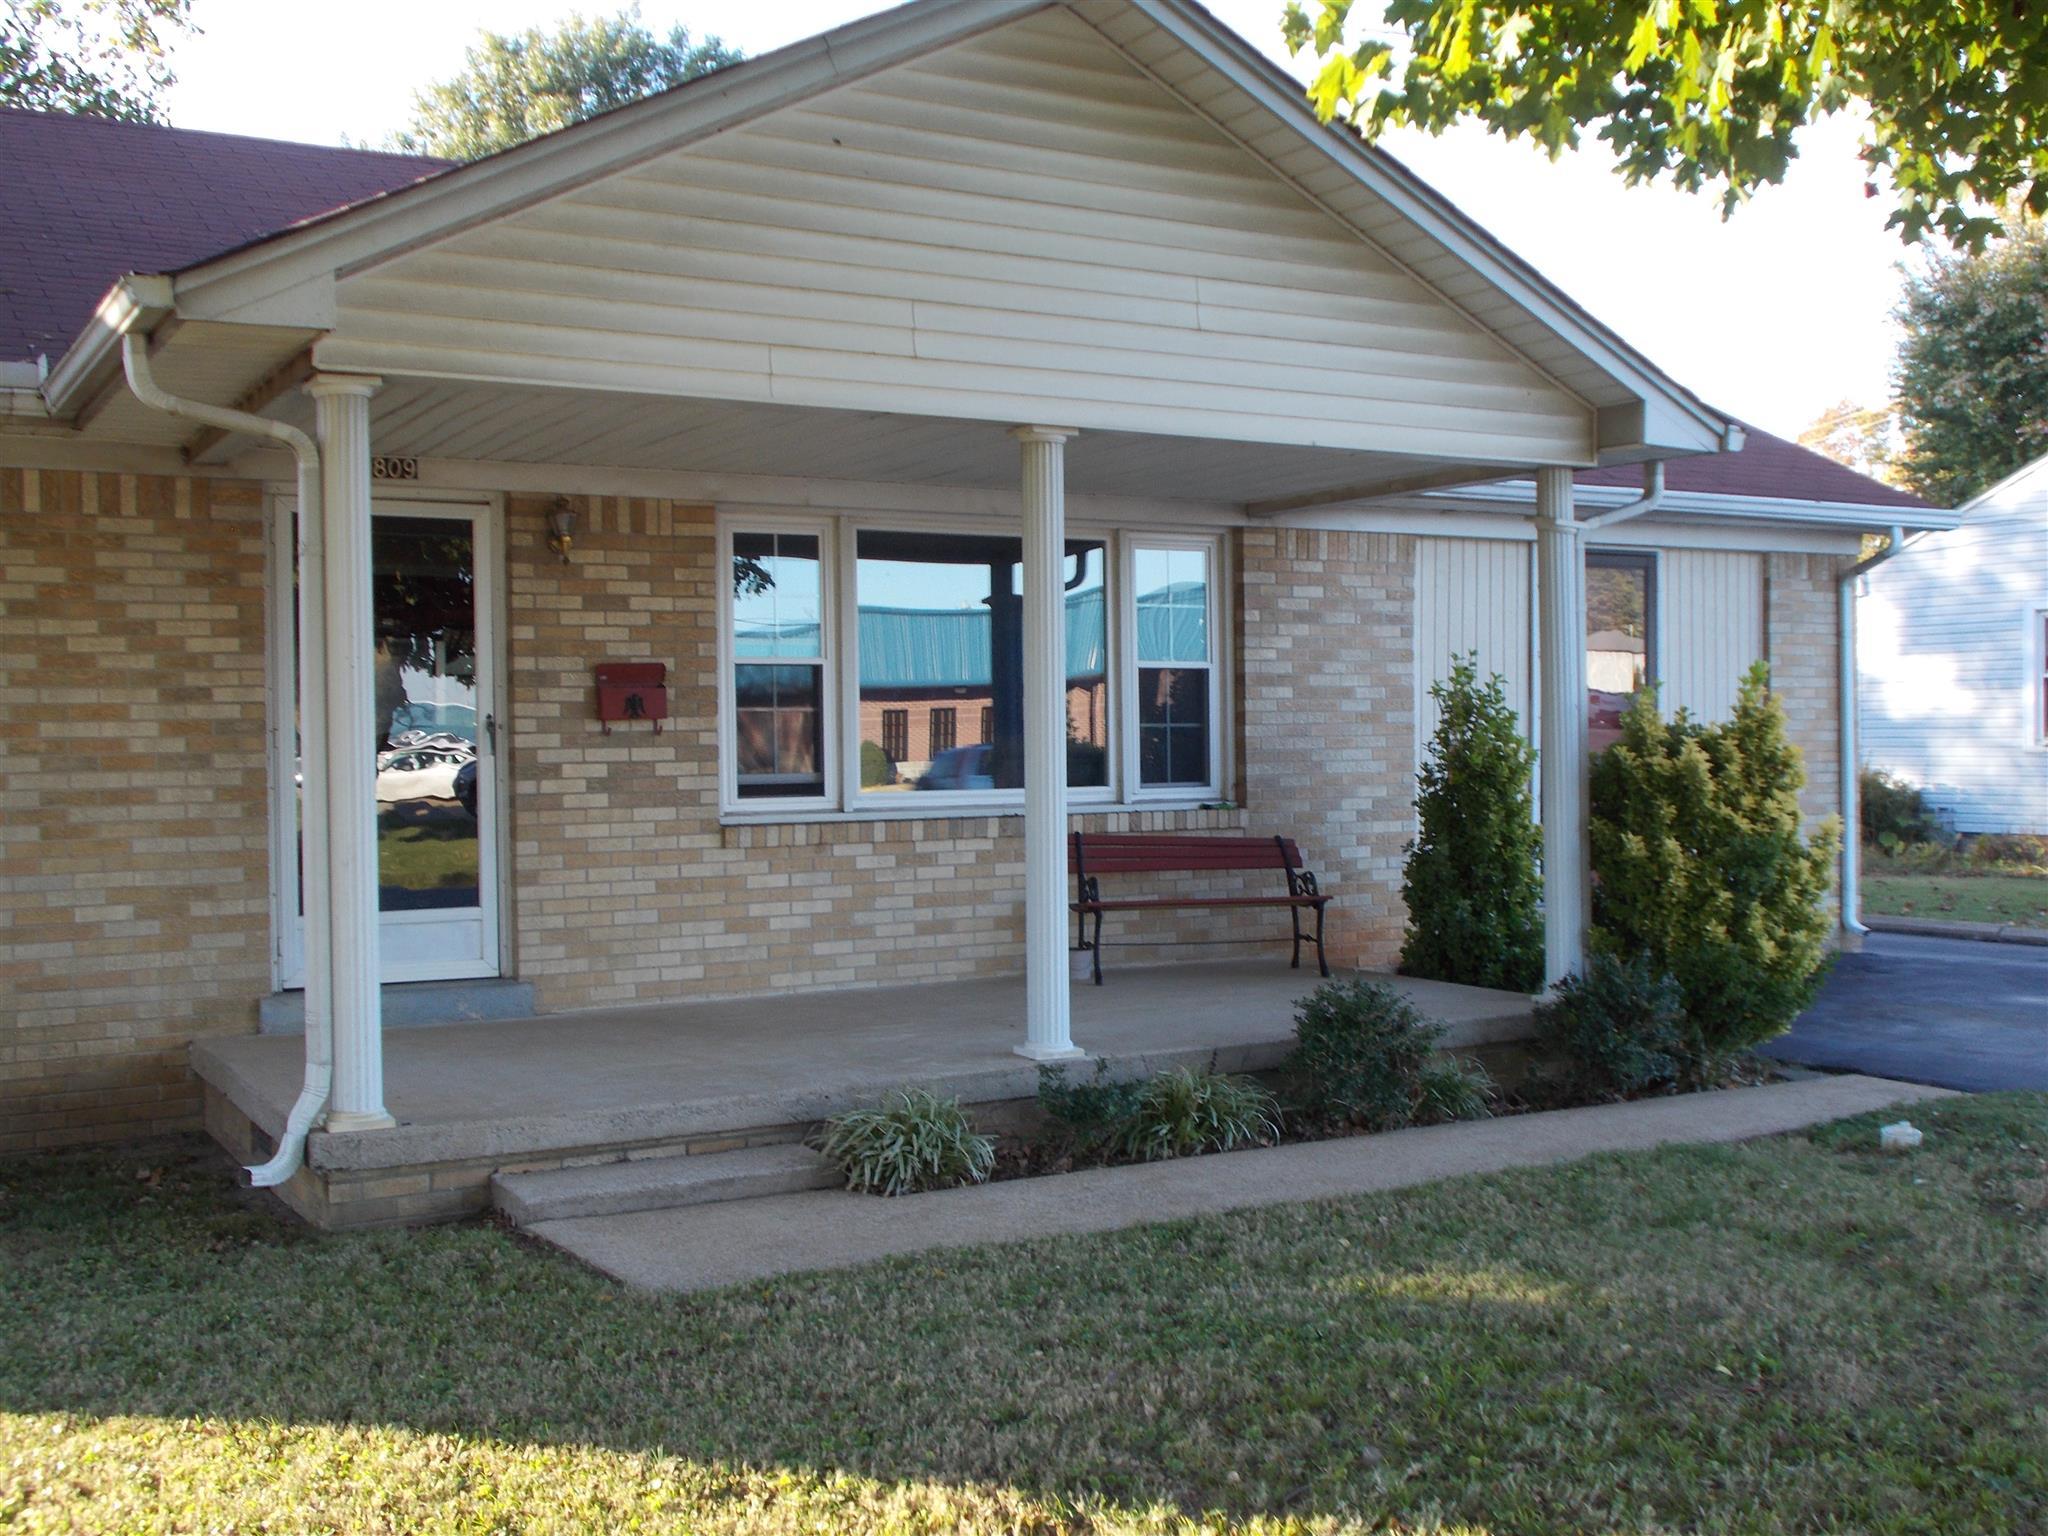 809 N Military Ave, Lawrenceburg, TN 38464